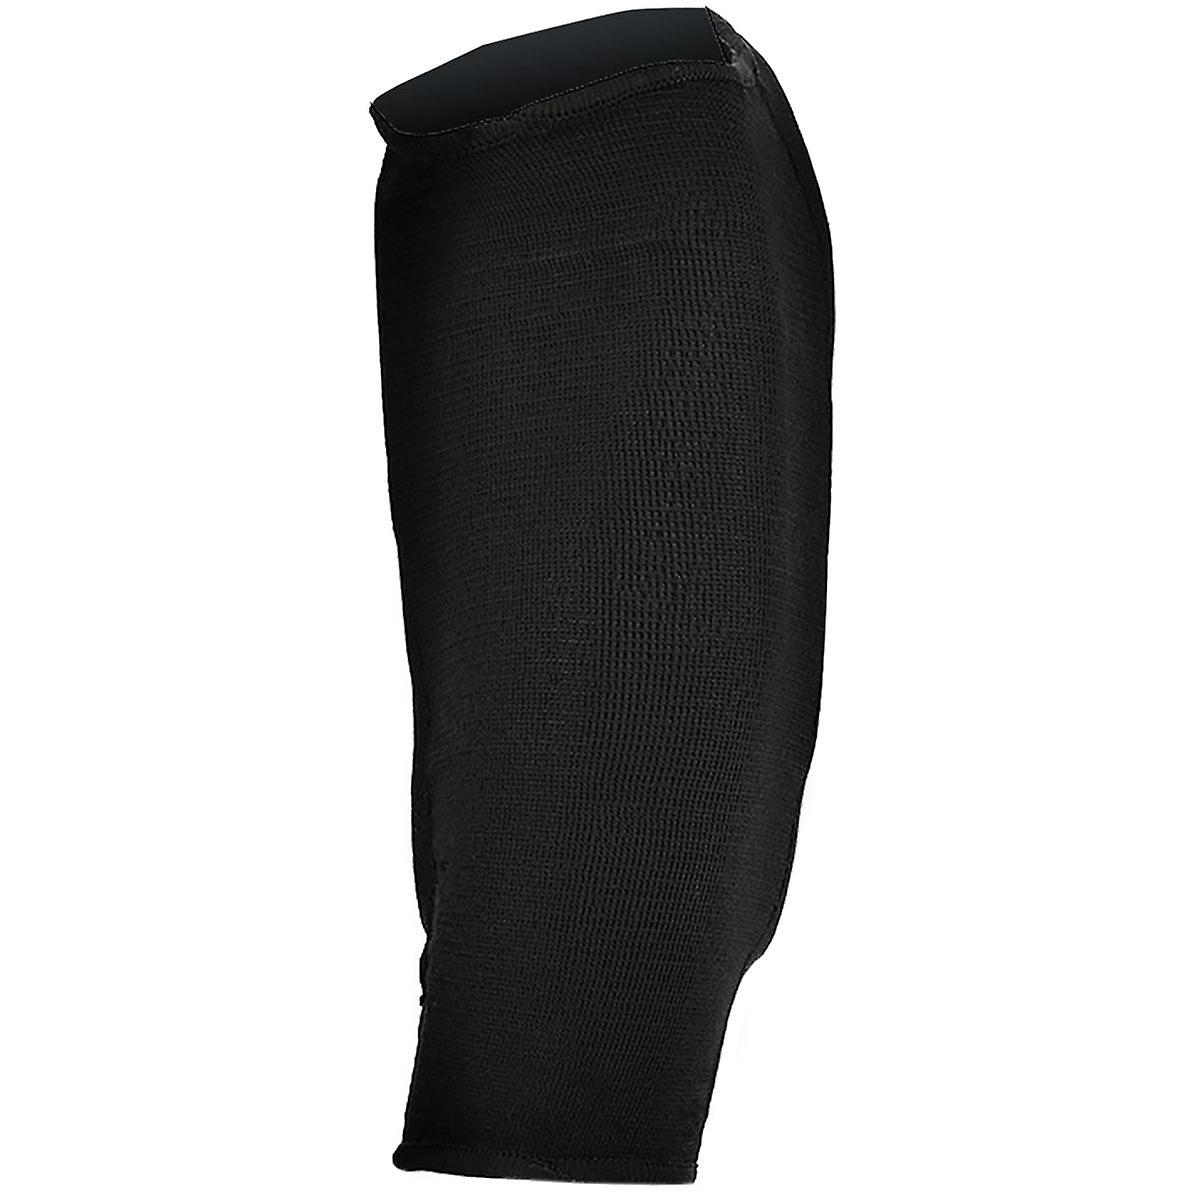 Century Martial Arts Cloth Light-Impact Training Forearm Pads - Black